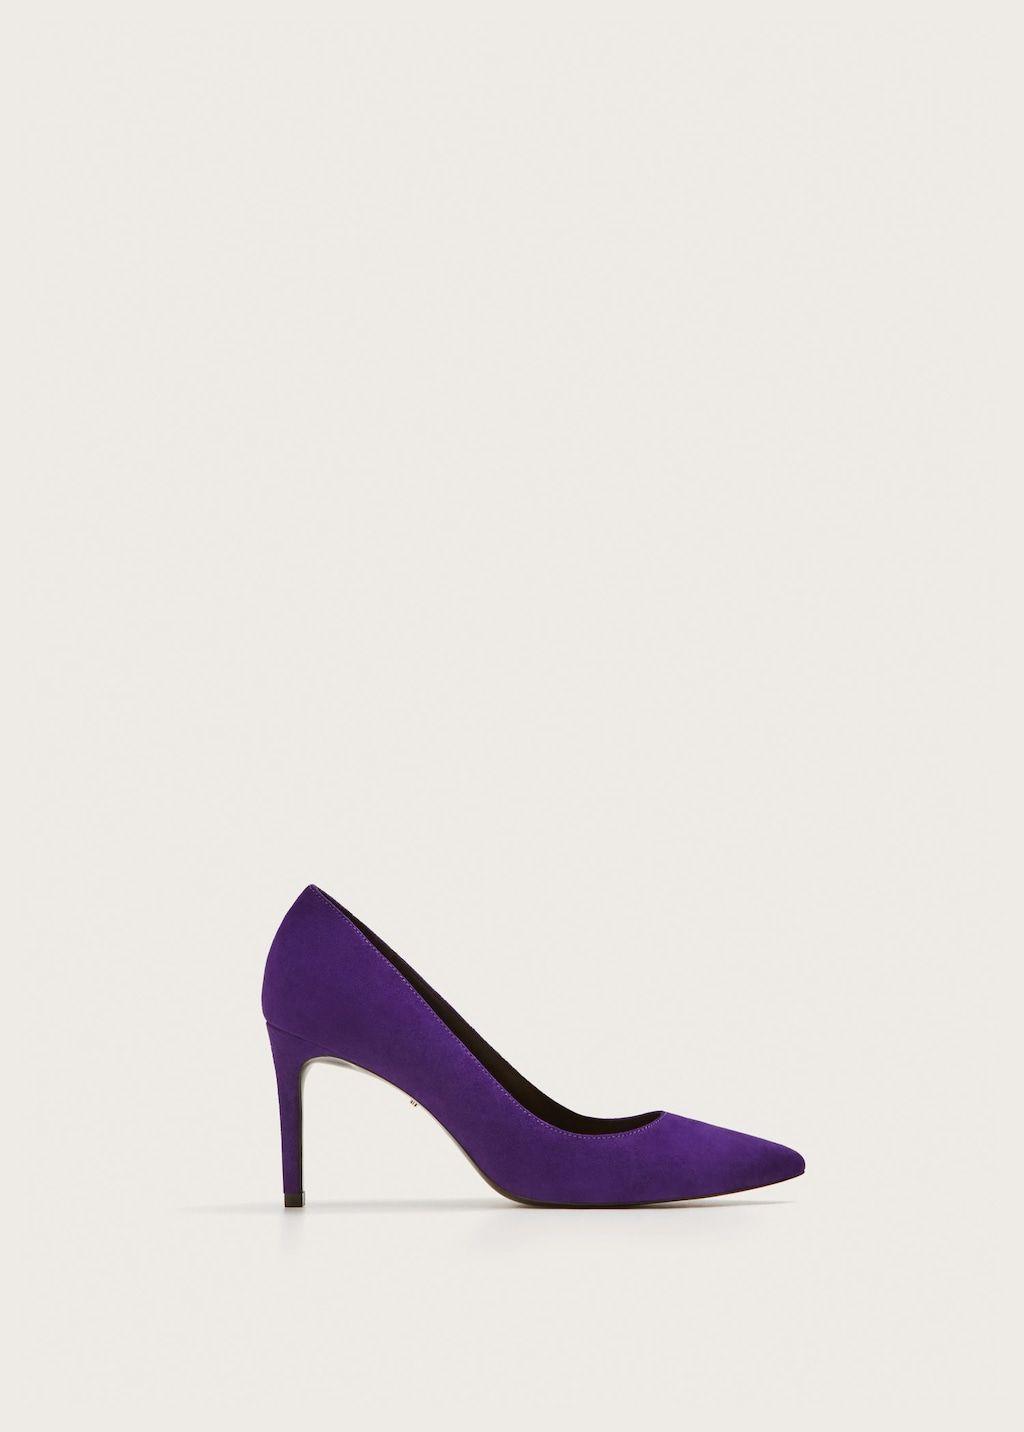 Leather Pumps Plus Sizes Violeta By Mango United Kingdom Tallas Grandes Calzas Violeta By Mango